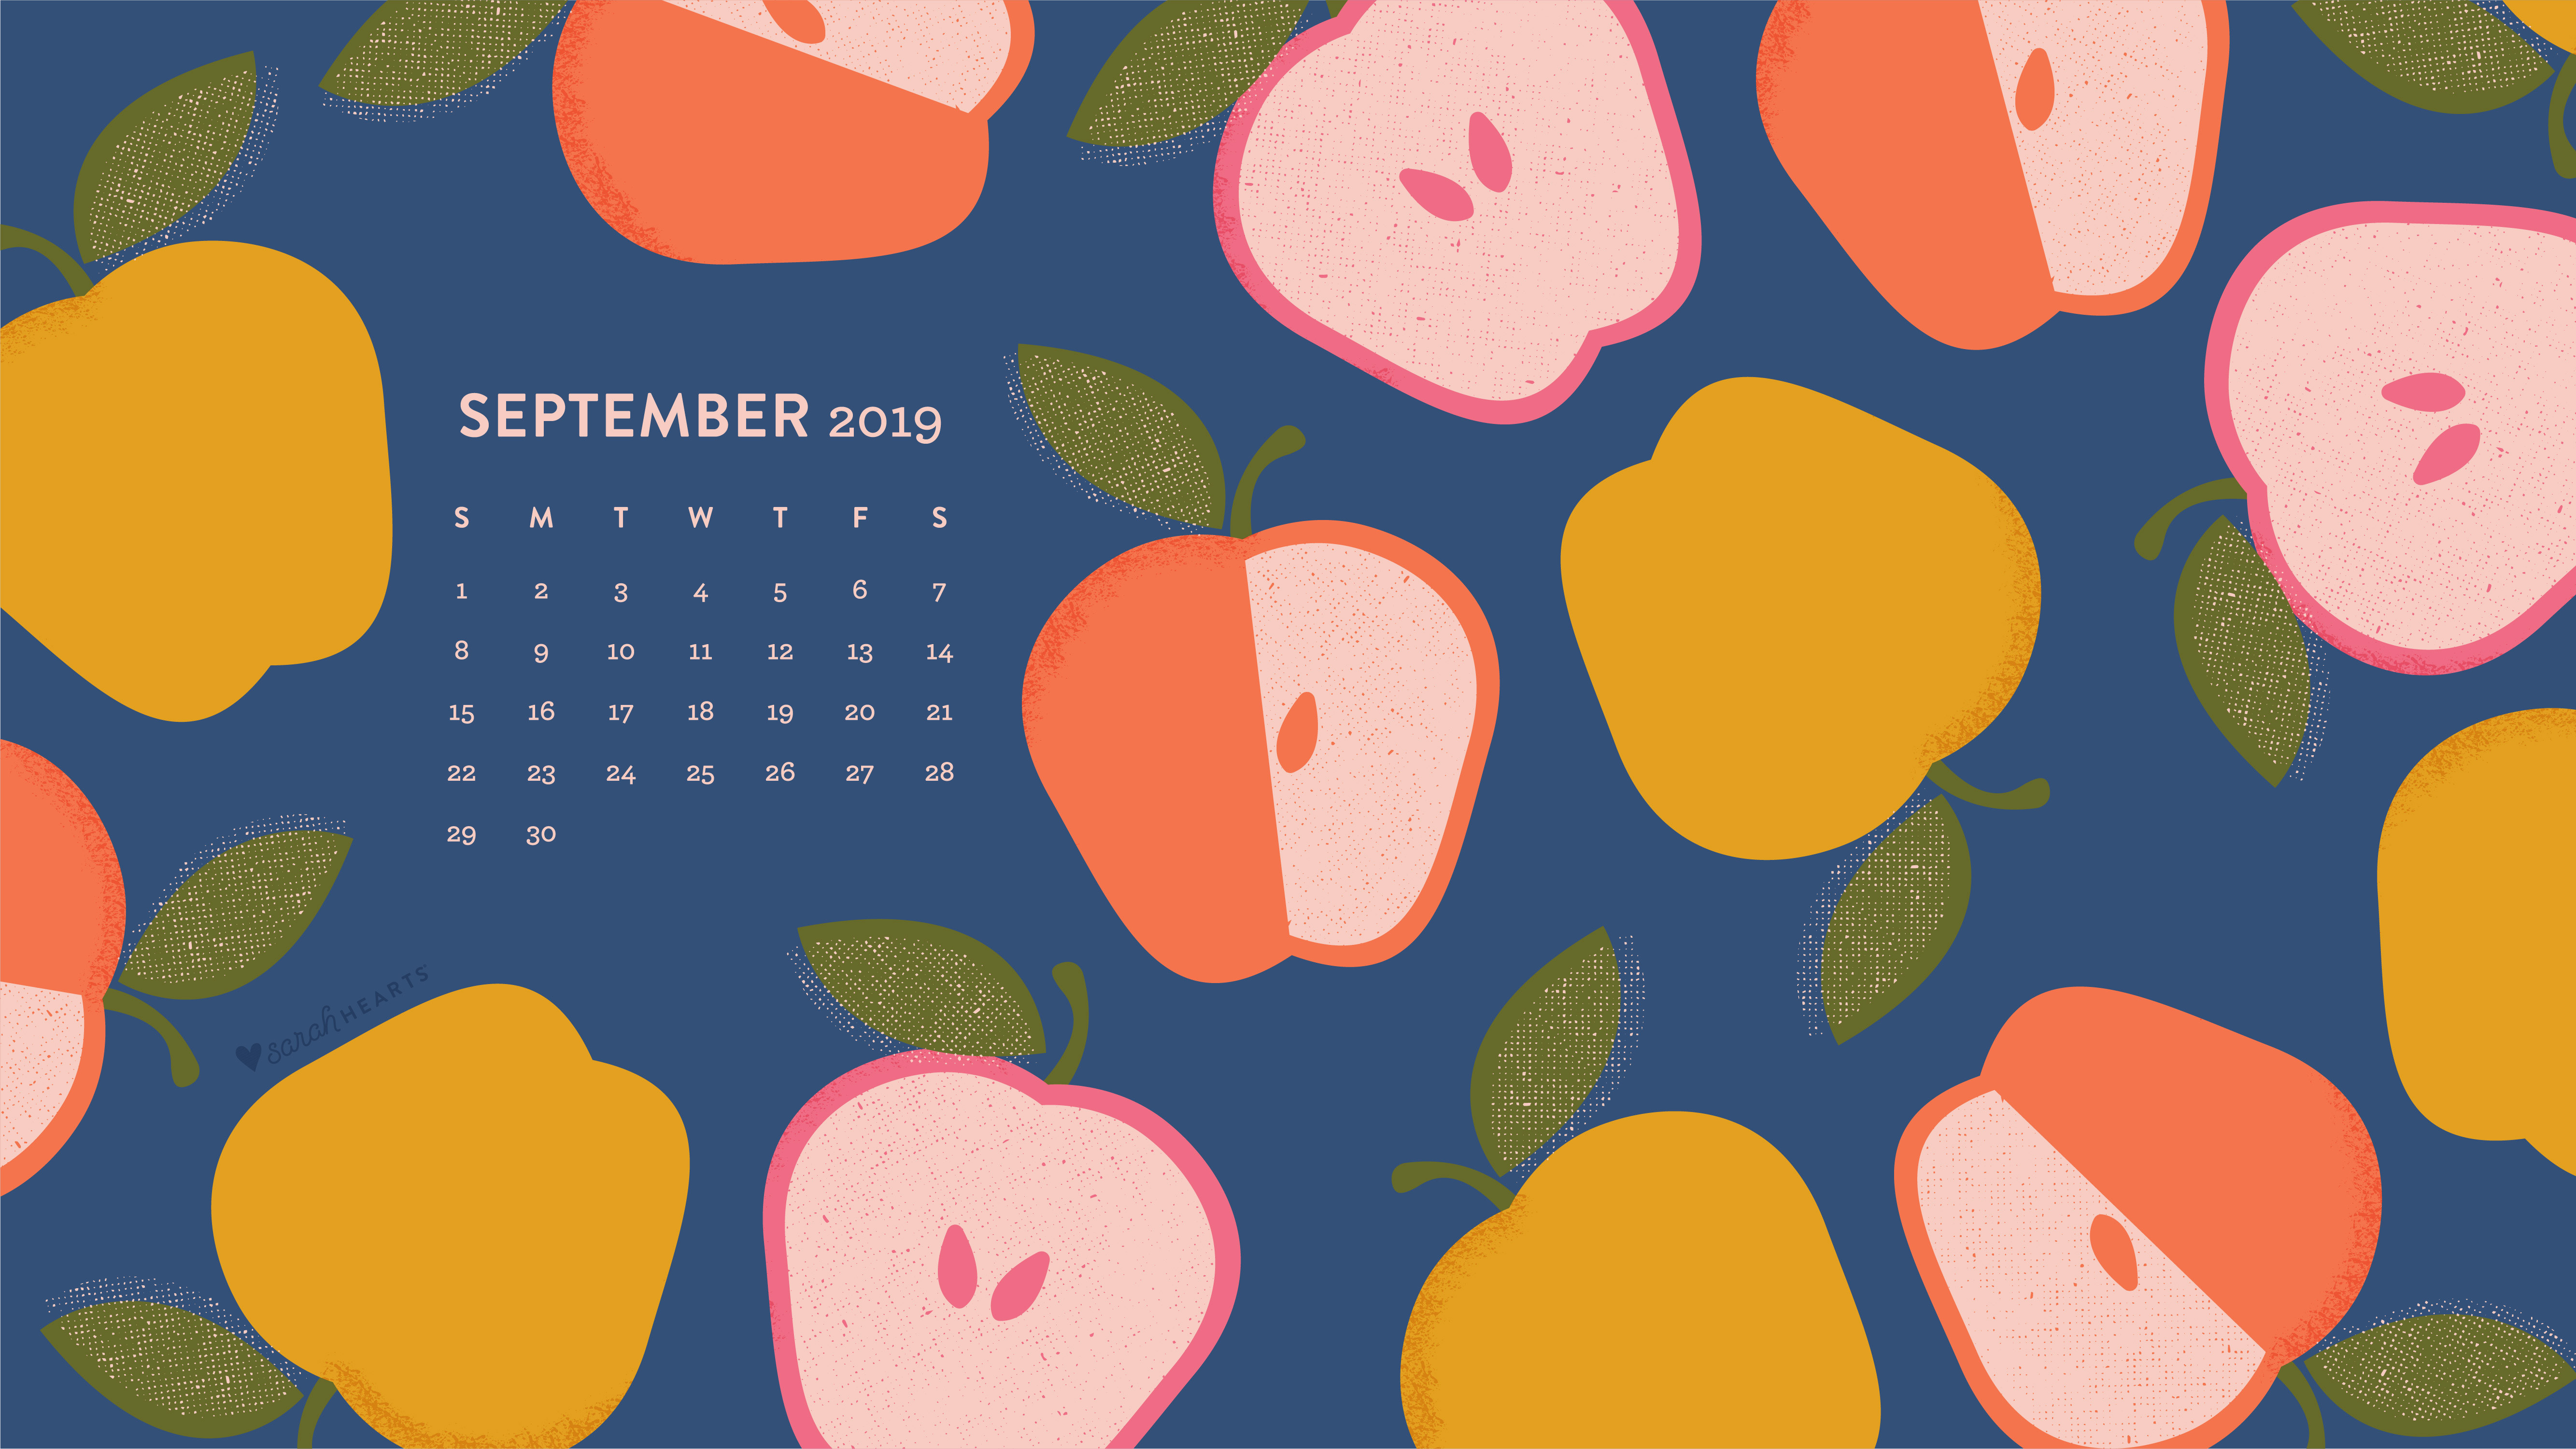 Colorful Apple September 2019 Calendar Wallpaper   Sarah Hearts 5334x3001